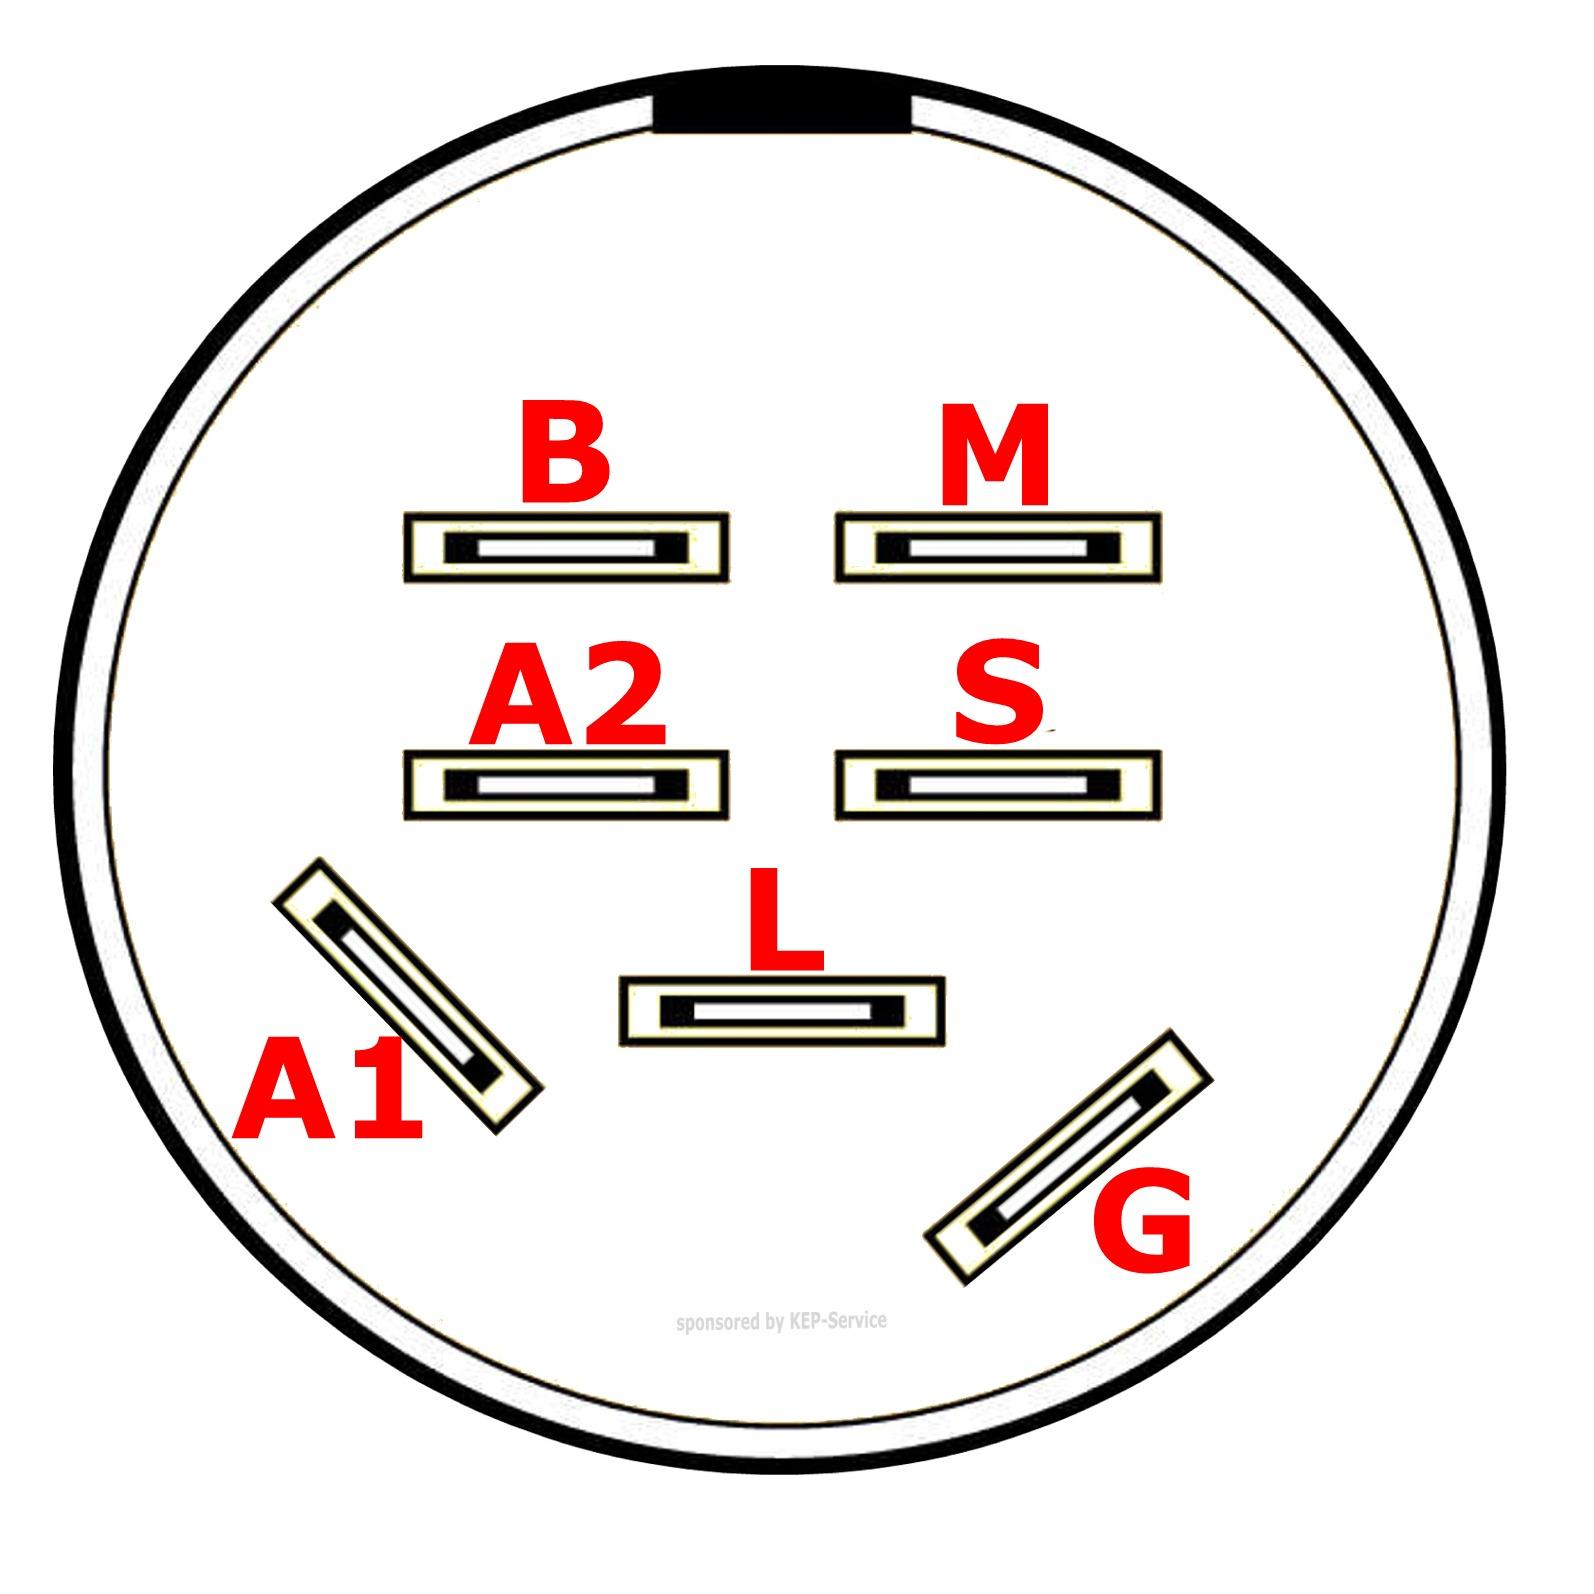 Erfreut 7 Poliger Schaltplan Galerie - Schaltplan Serie Circuit ...